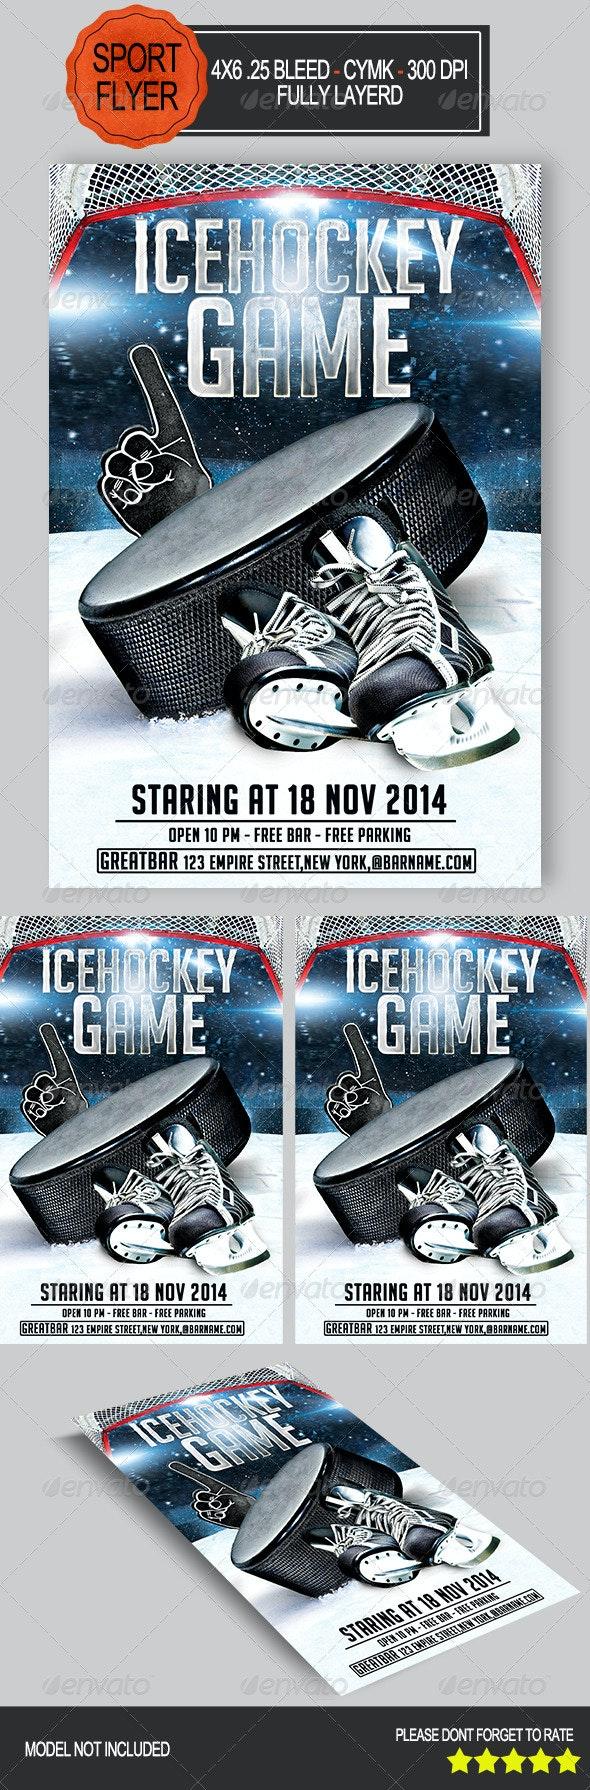 Ice Hockey Game Flyer   - Print Templates